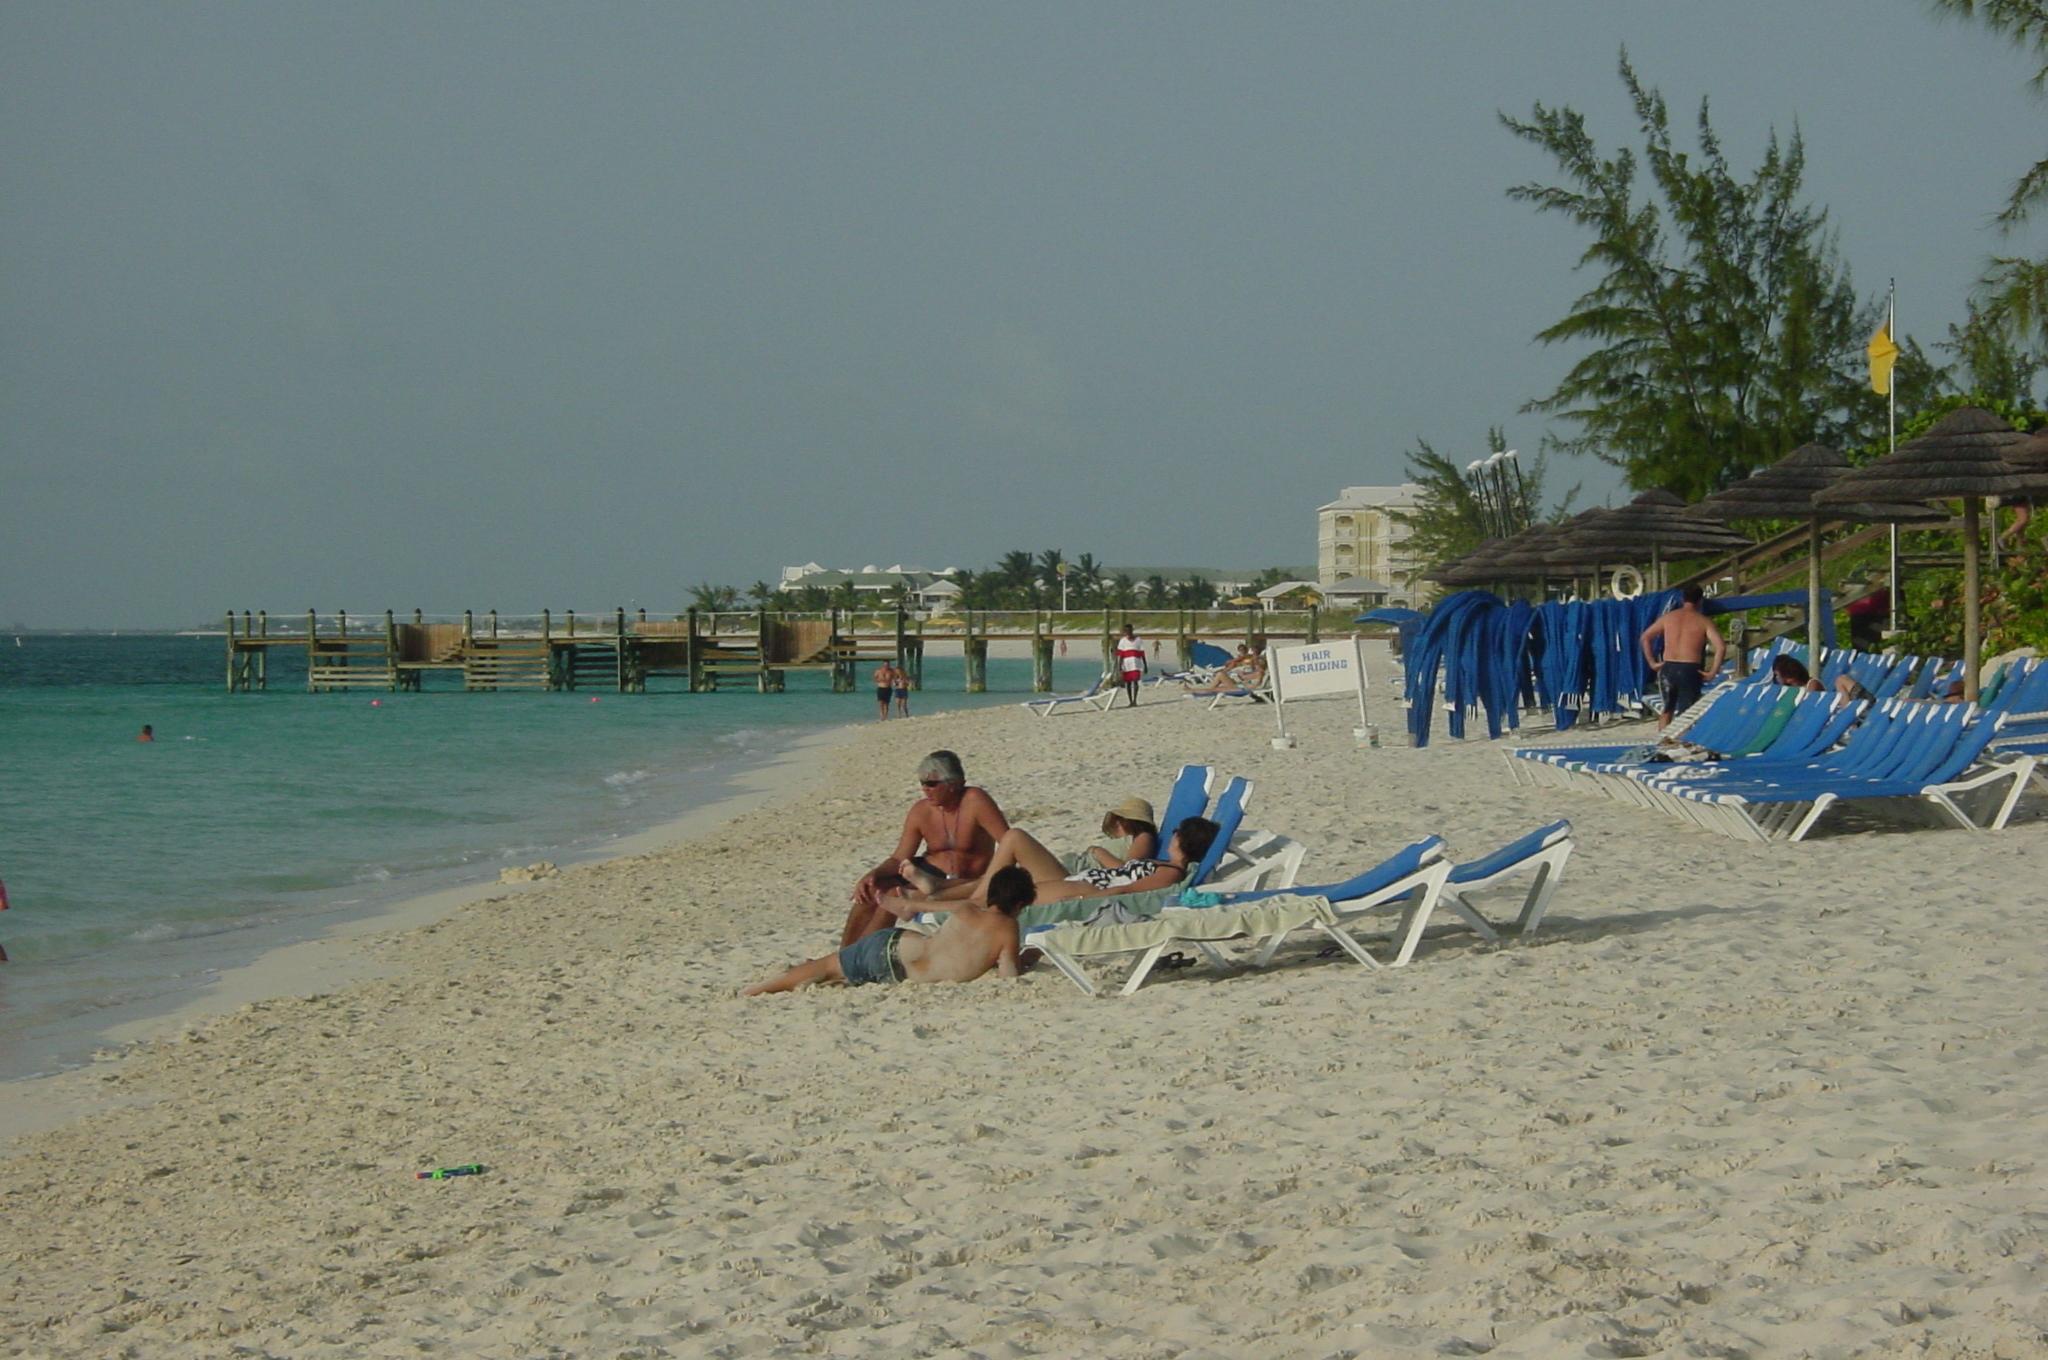 Beaches Turks And Caicos Restaurants